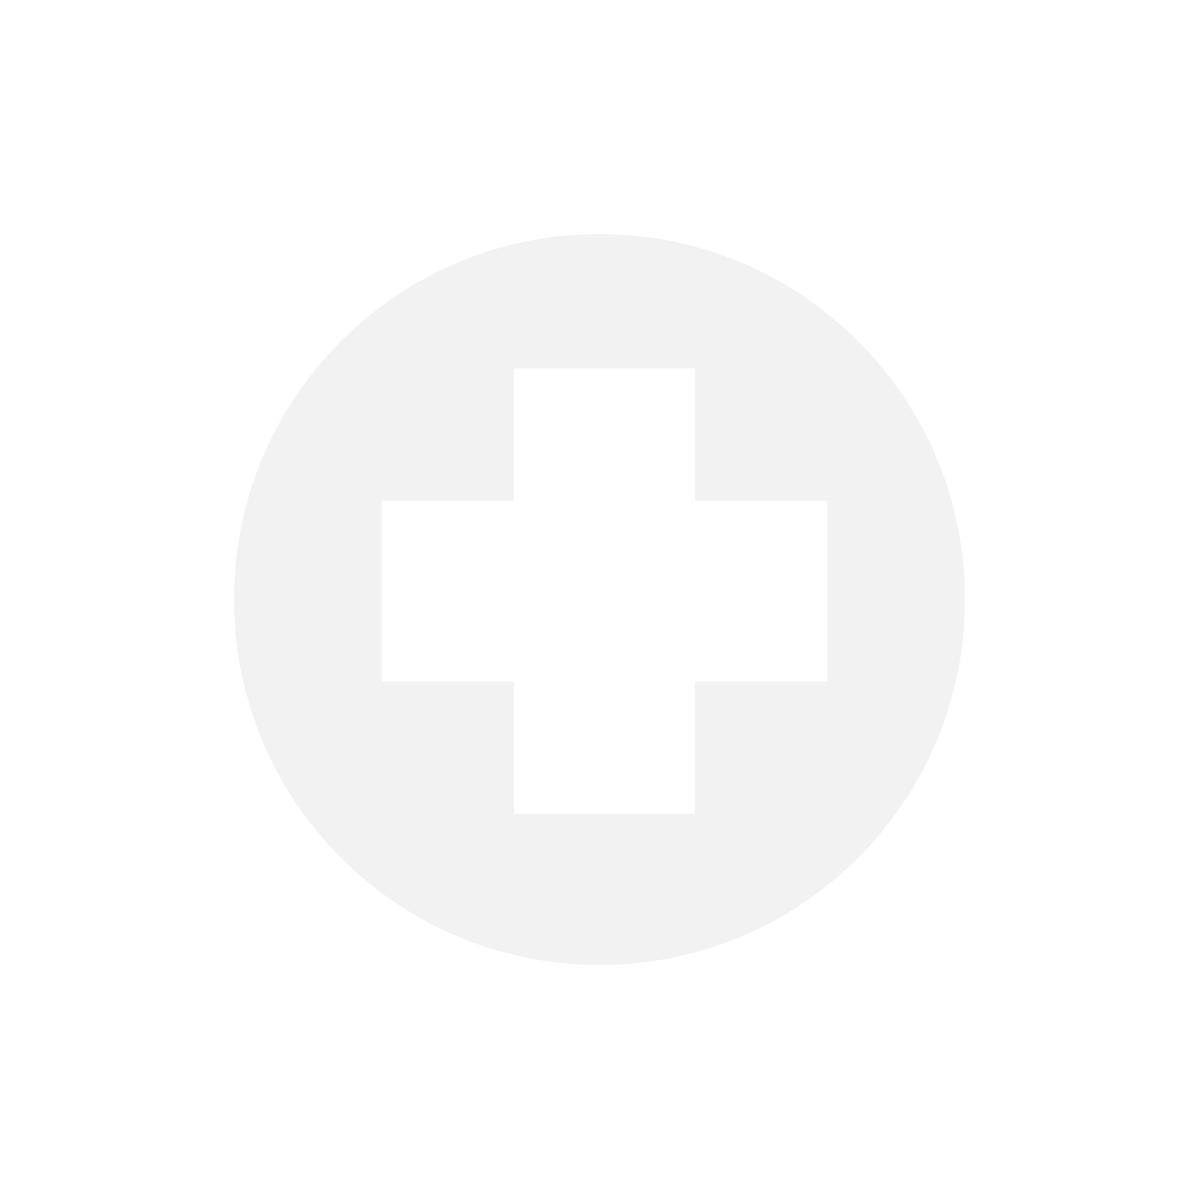 Genouillère élastique Stabilax™ Donjoy